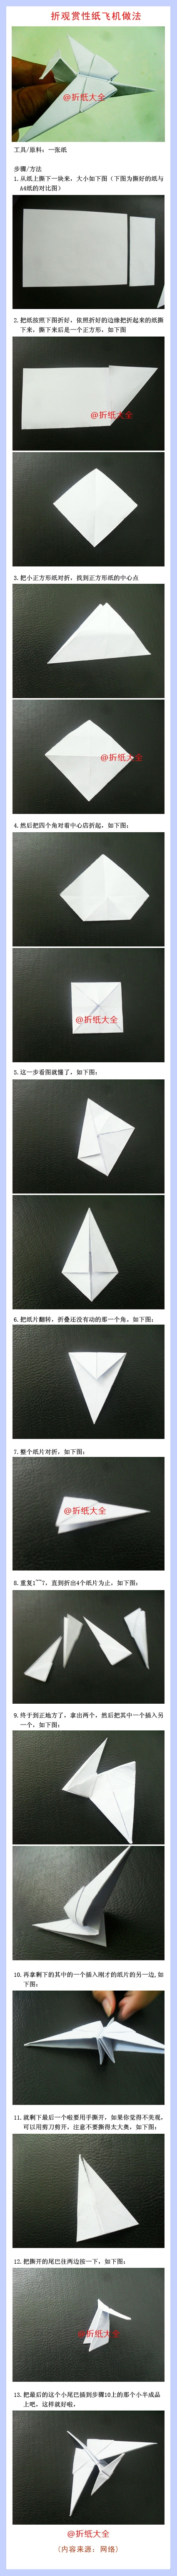 Origami Ornamental Airplane